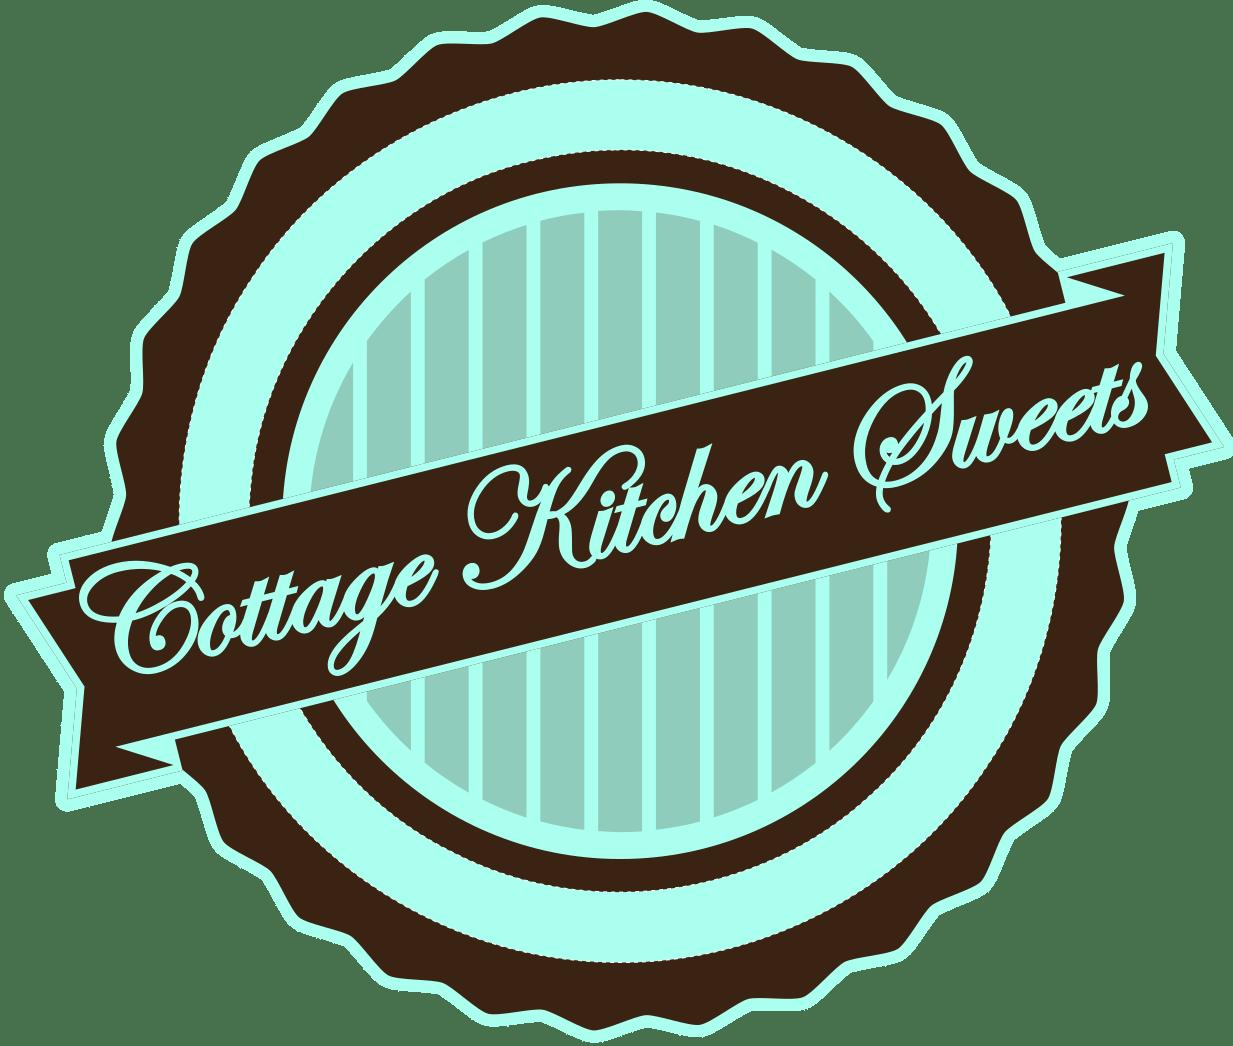 Cottage Kitchen Sweets Logo